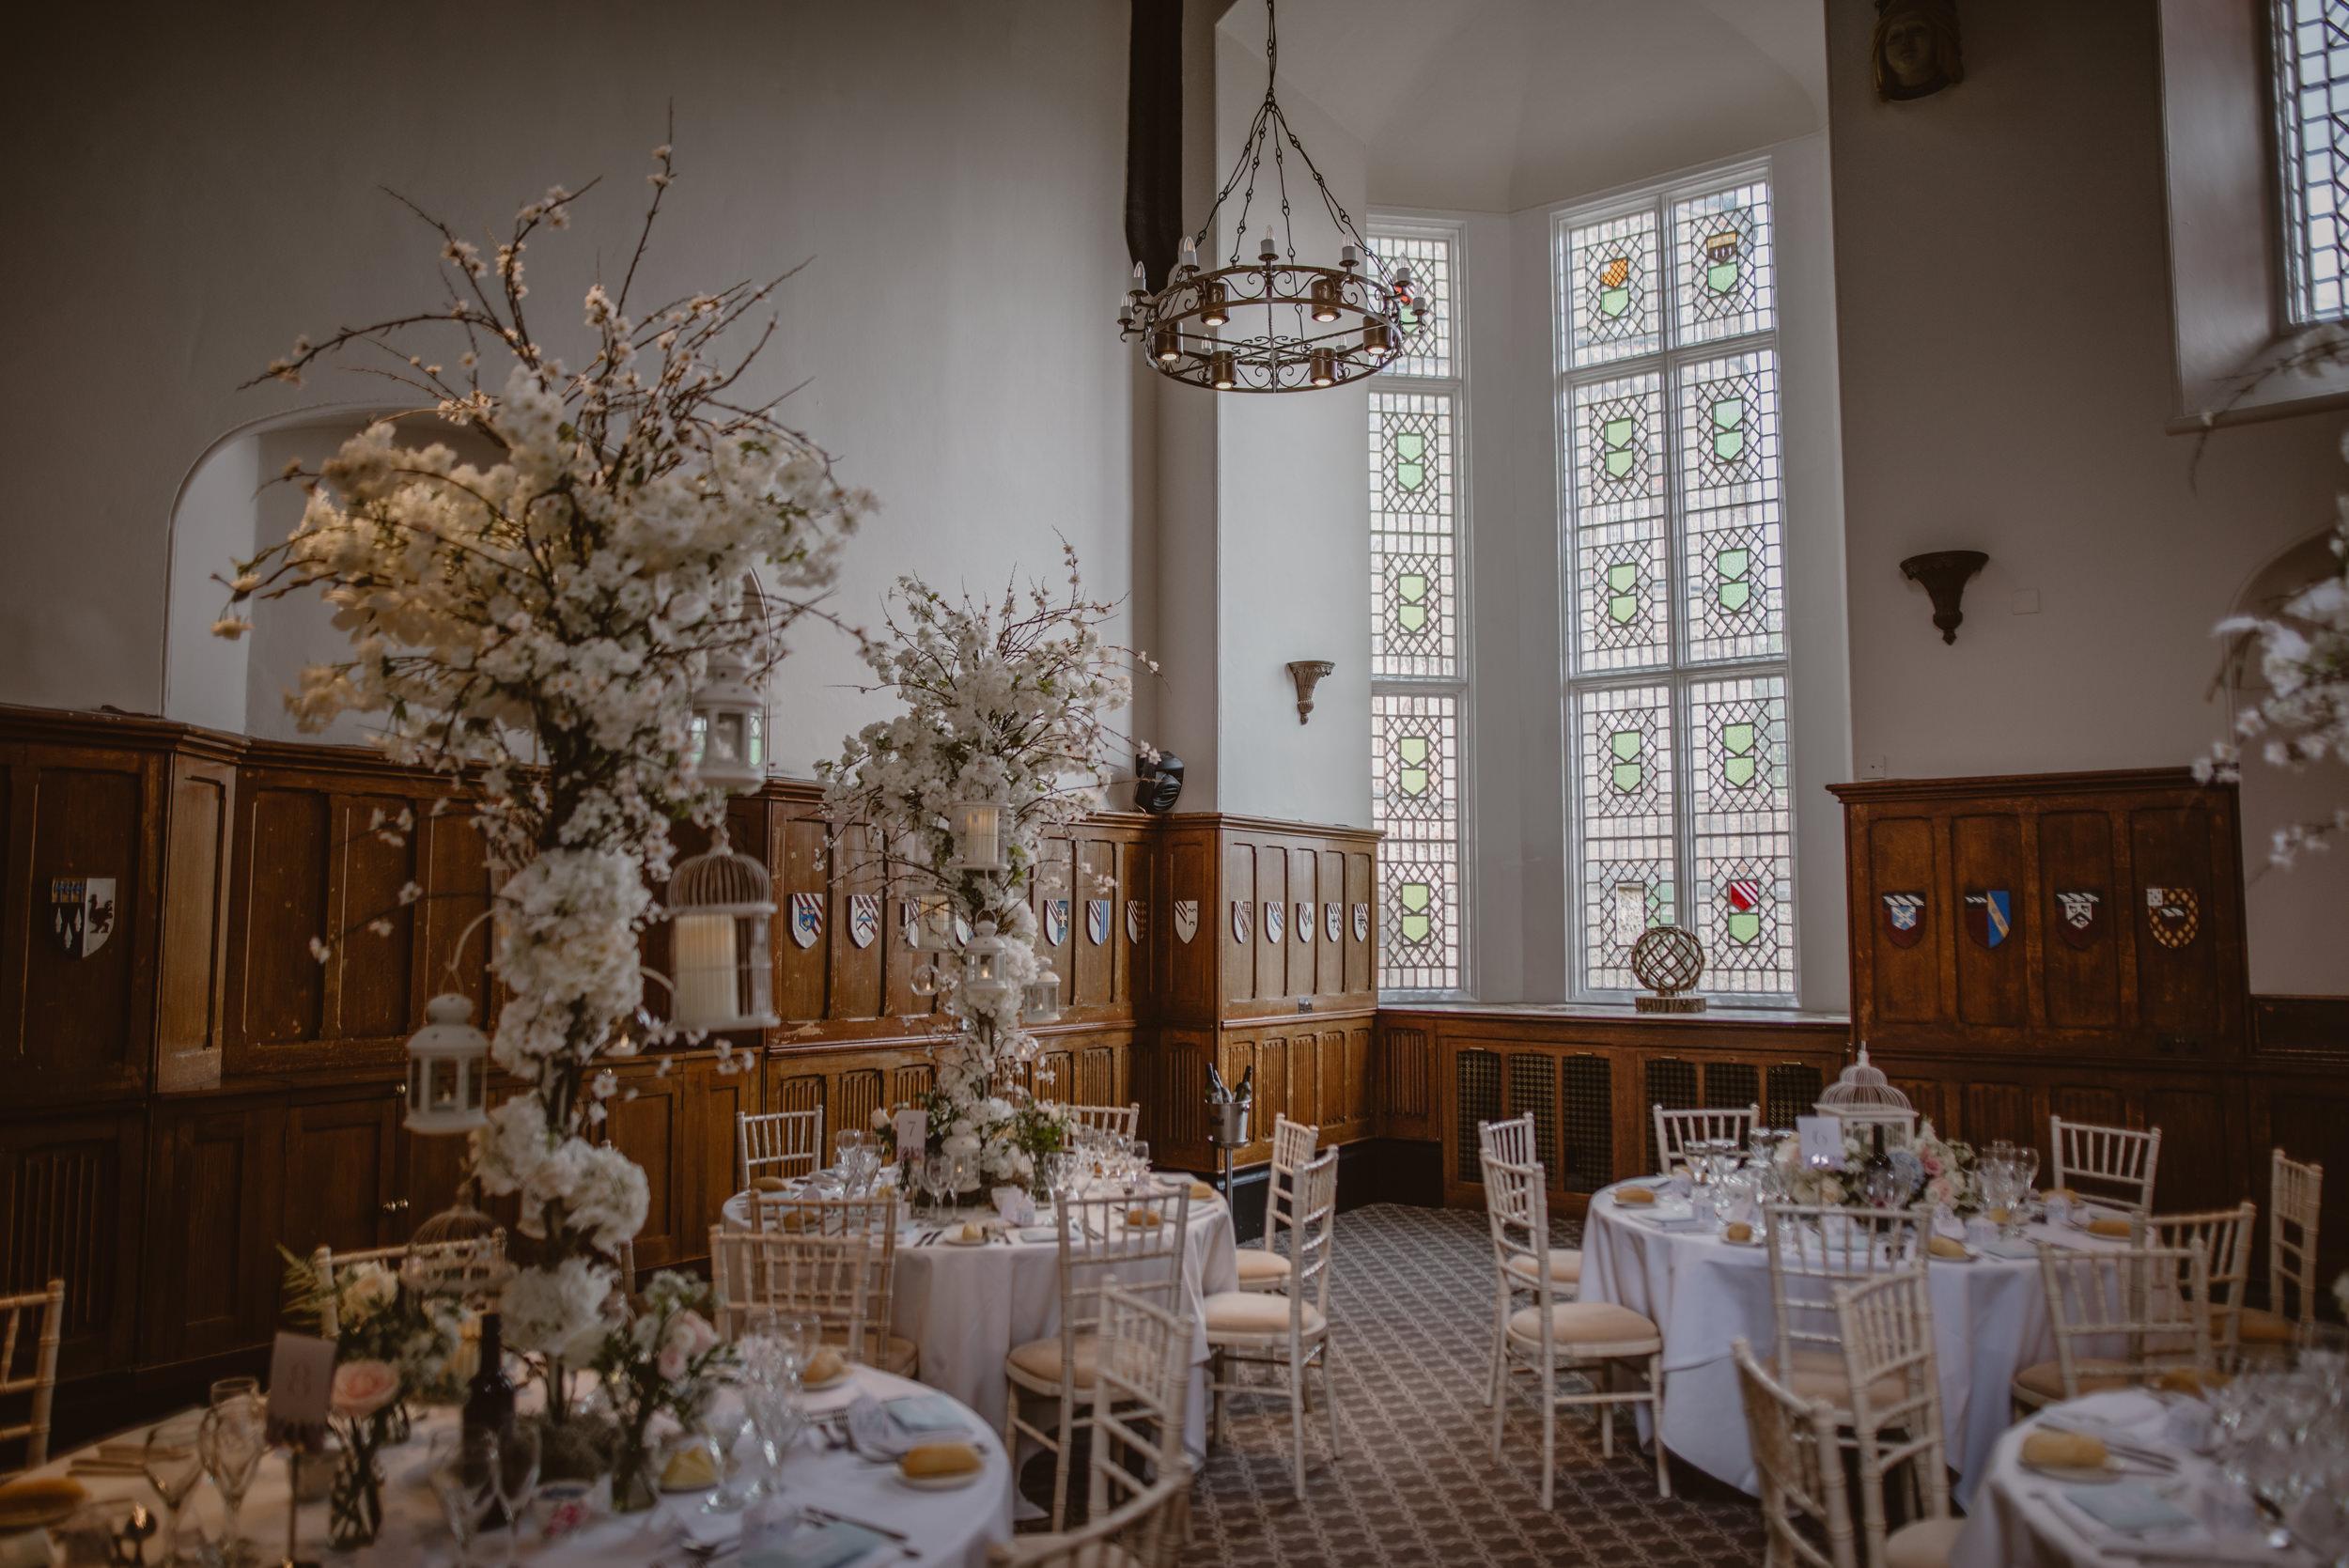 Rachel-and-James-Wedding-Horsley-Towers-State-Manu-Mendoza-Wedding-Photography-373.jpg